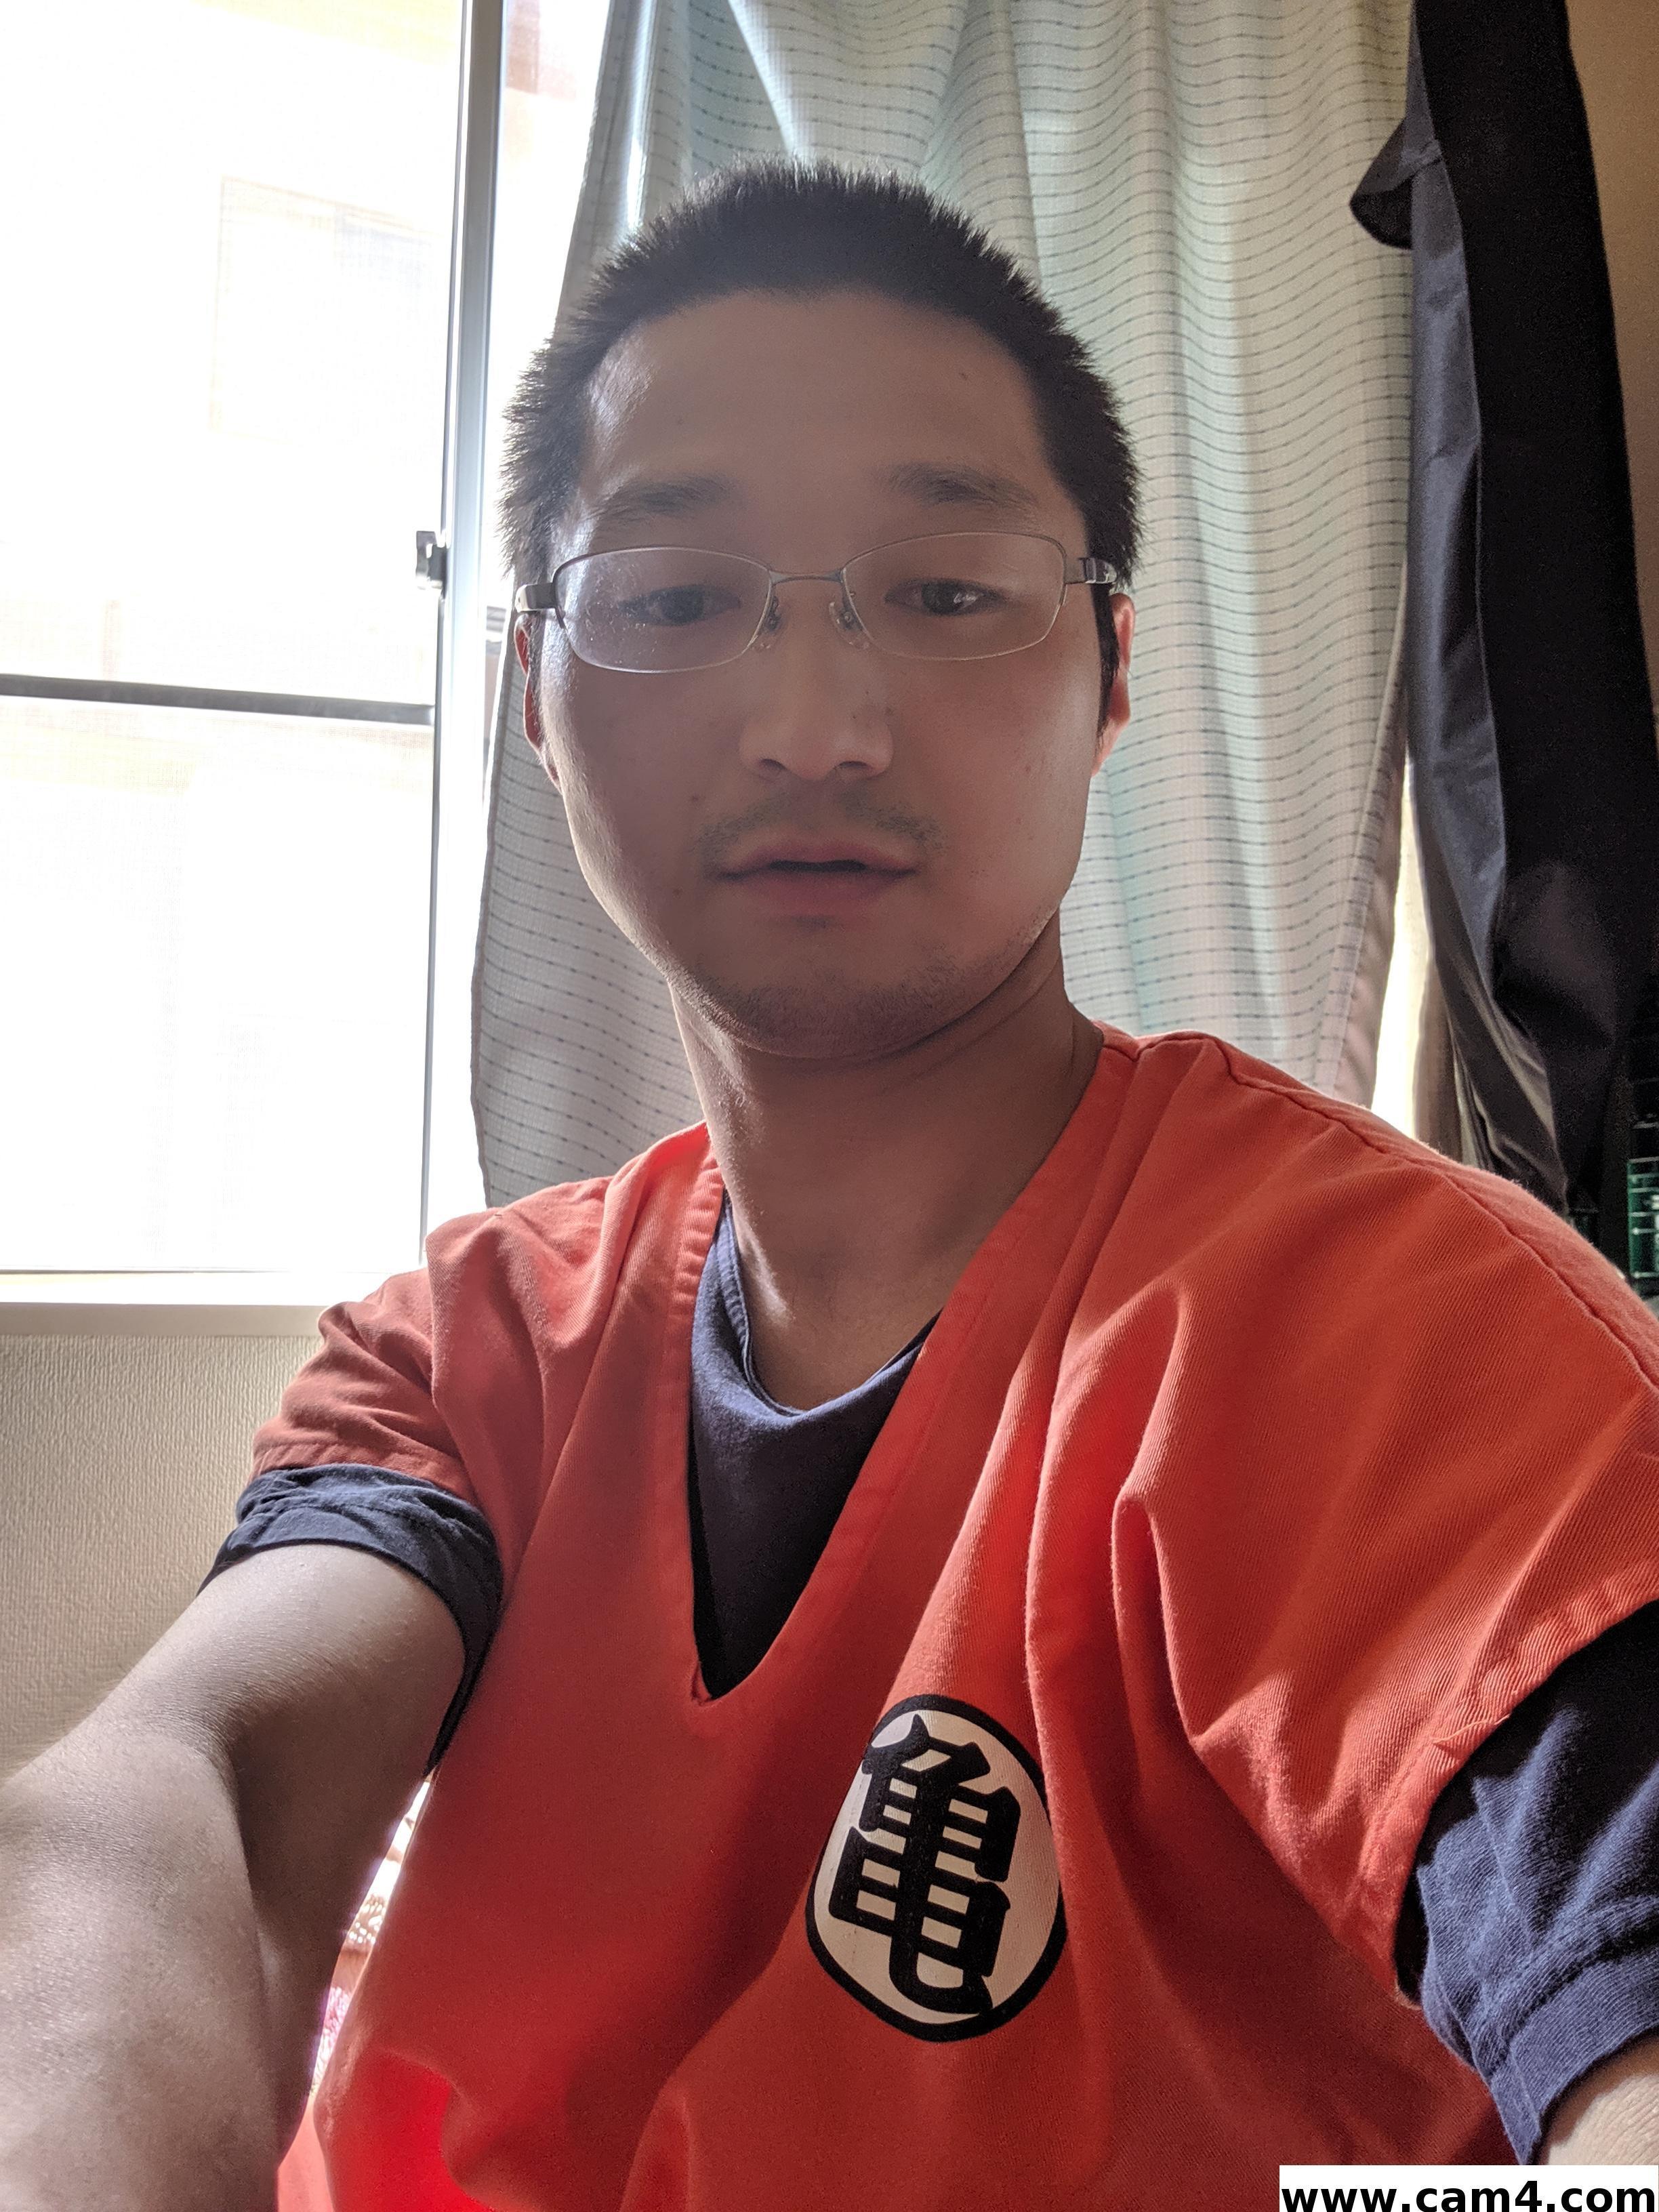 Hatimaki1016?s=zv+tjnl1hfieijslpg2cjhg2ukm+t8ziavrwmllrfrw=